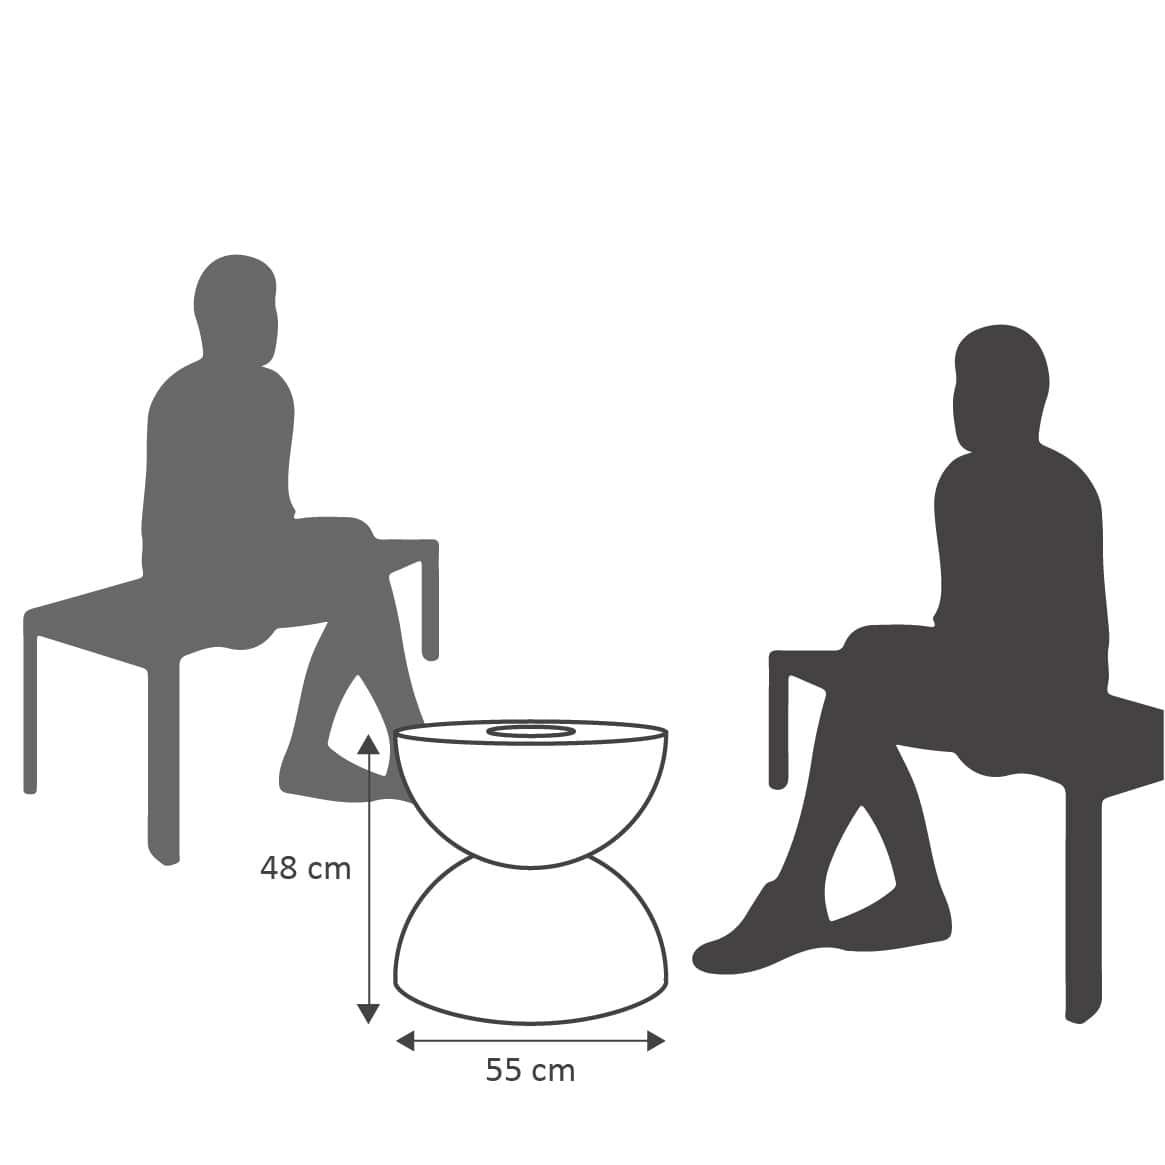 Mesa de Centro 55x48 cm com Vaso VASART